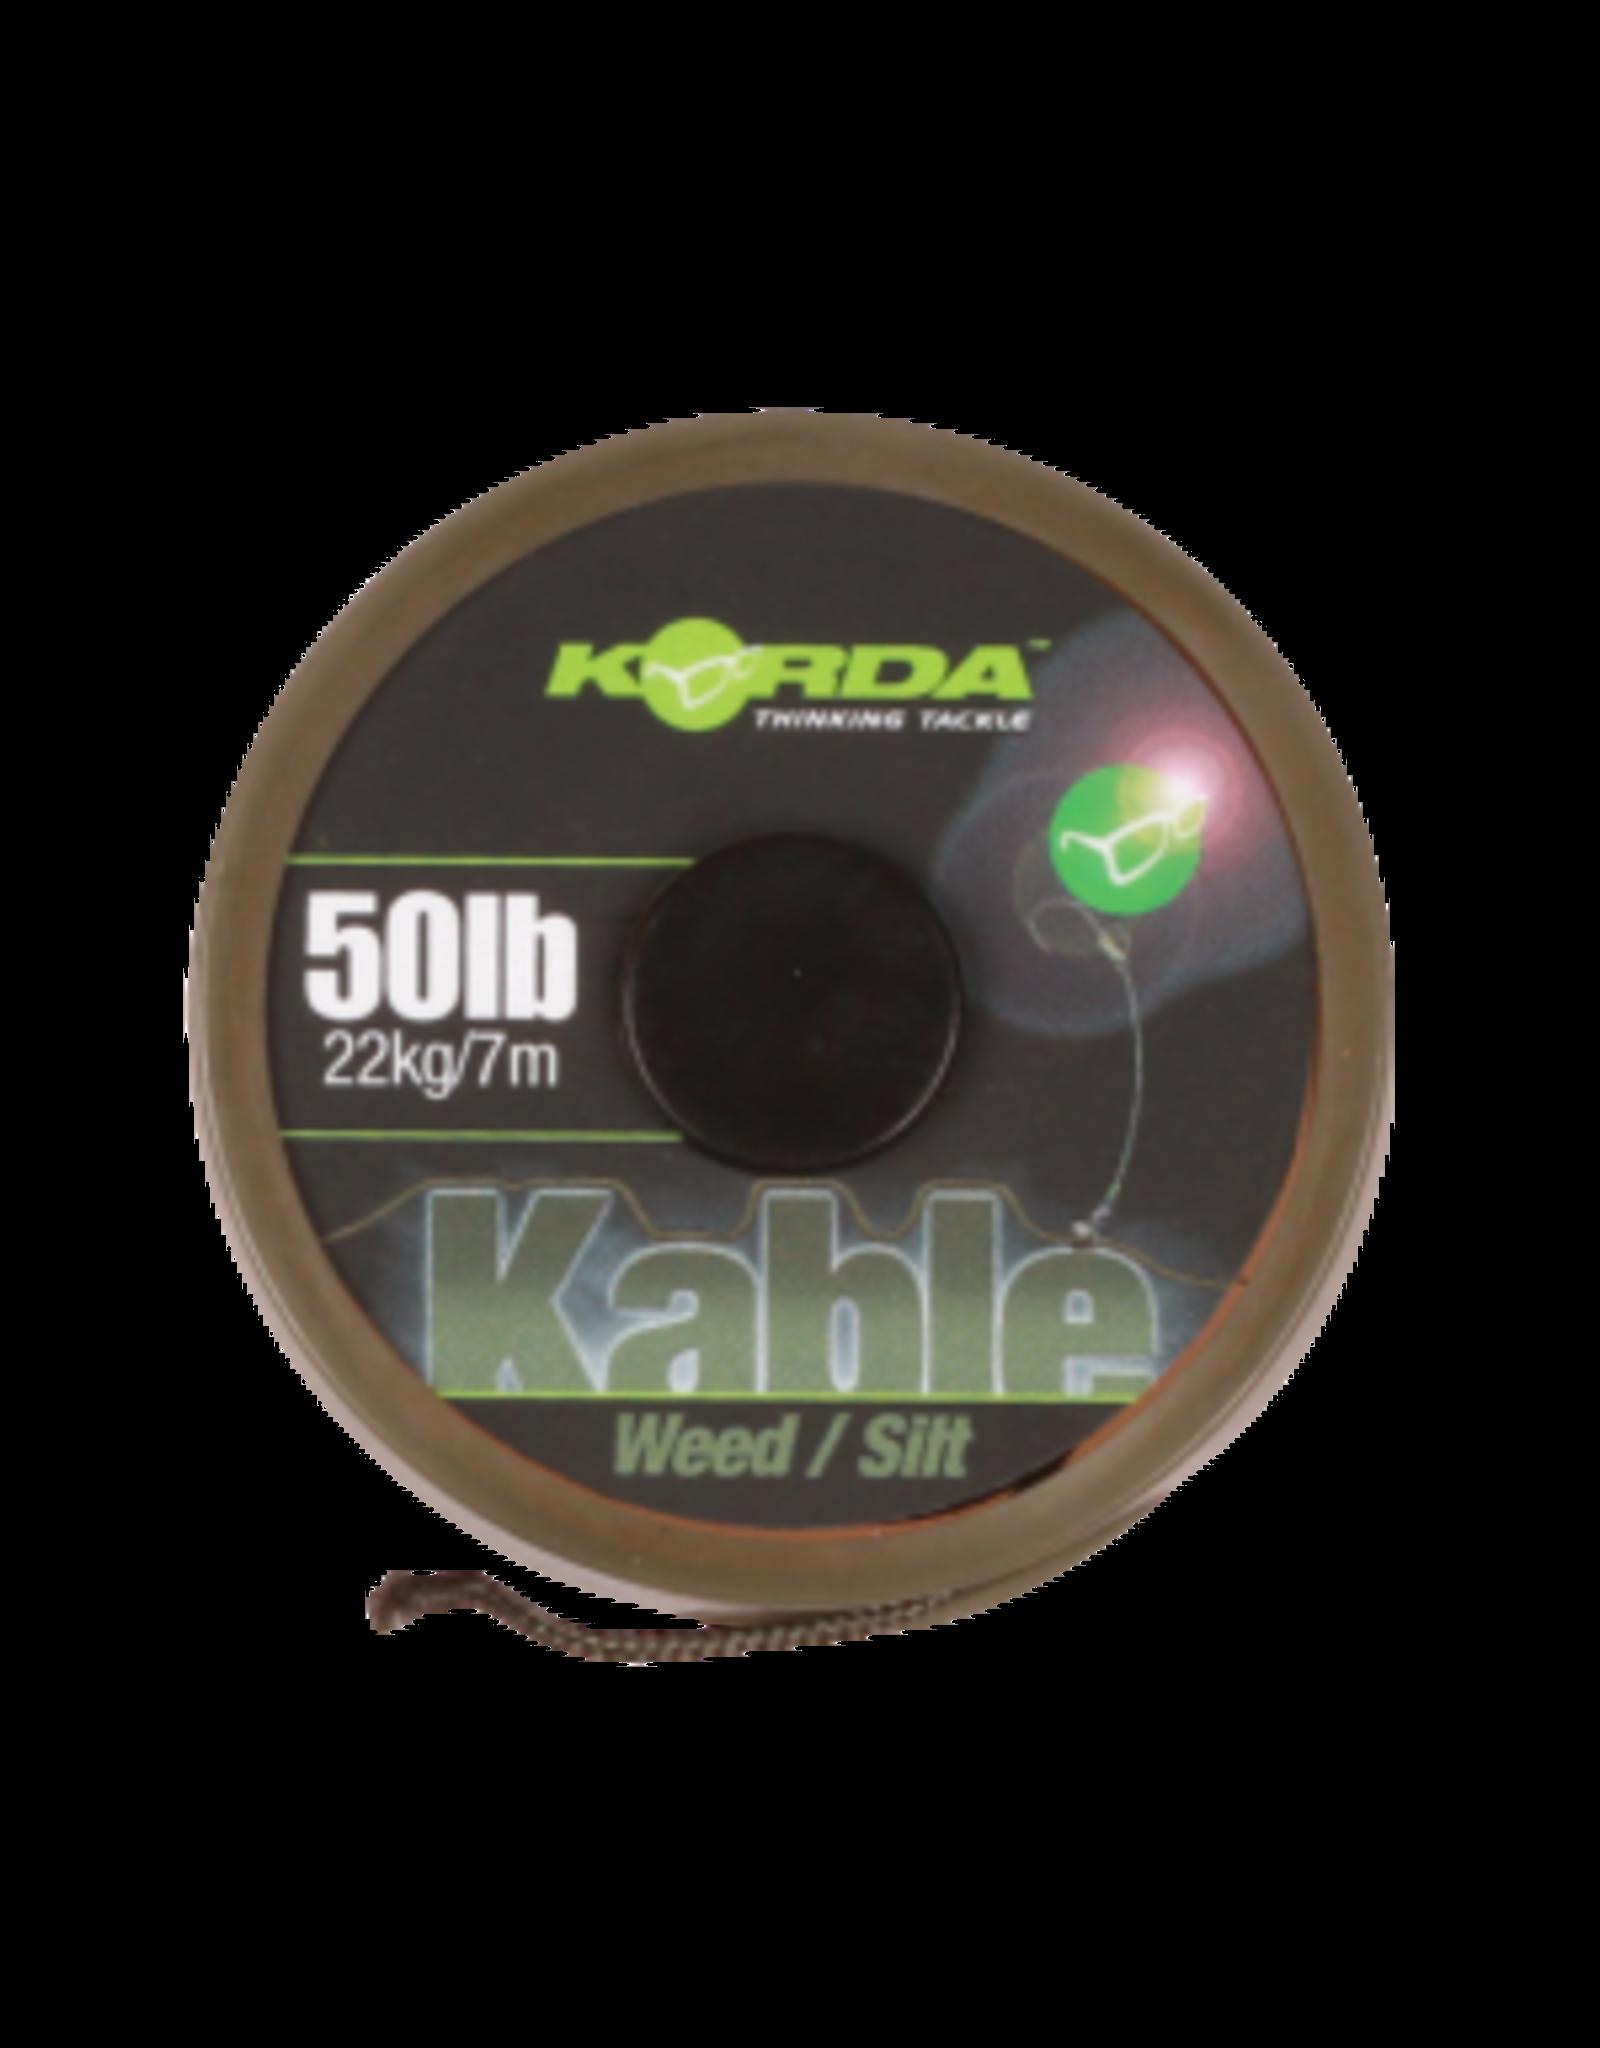 KORDA Kable Leadcore Weed / Silt 7 m.